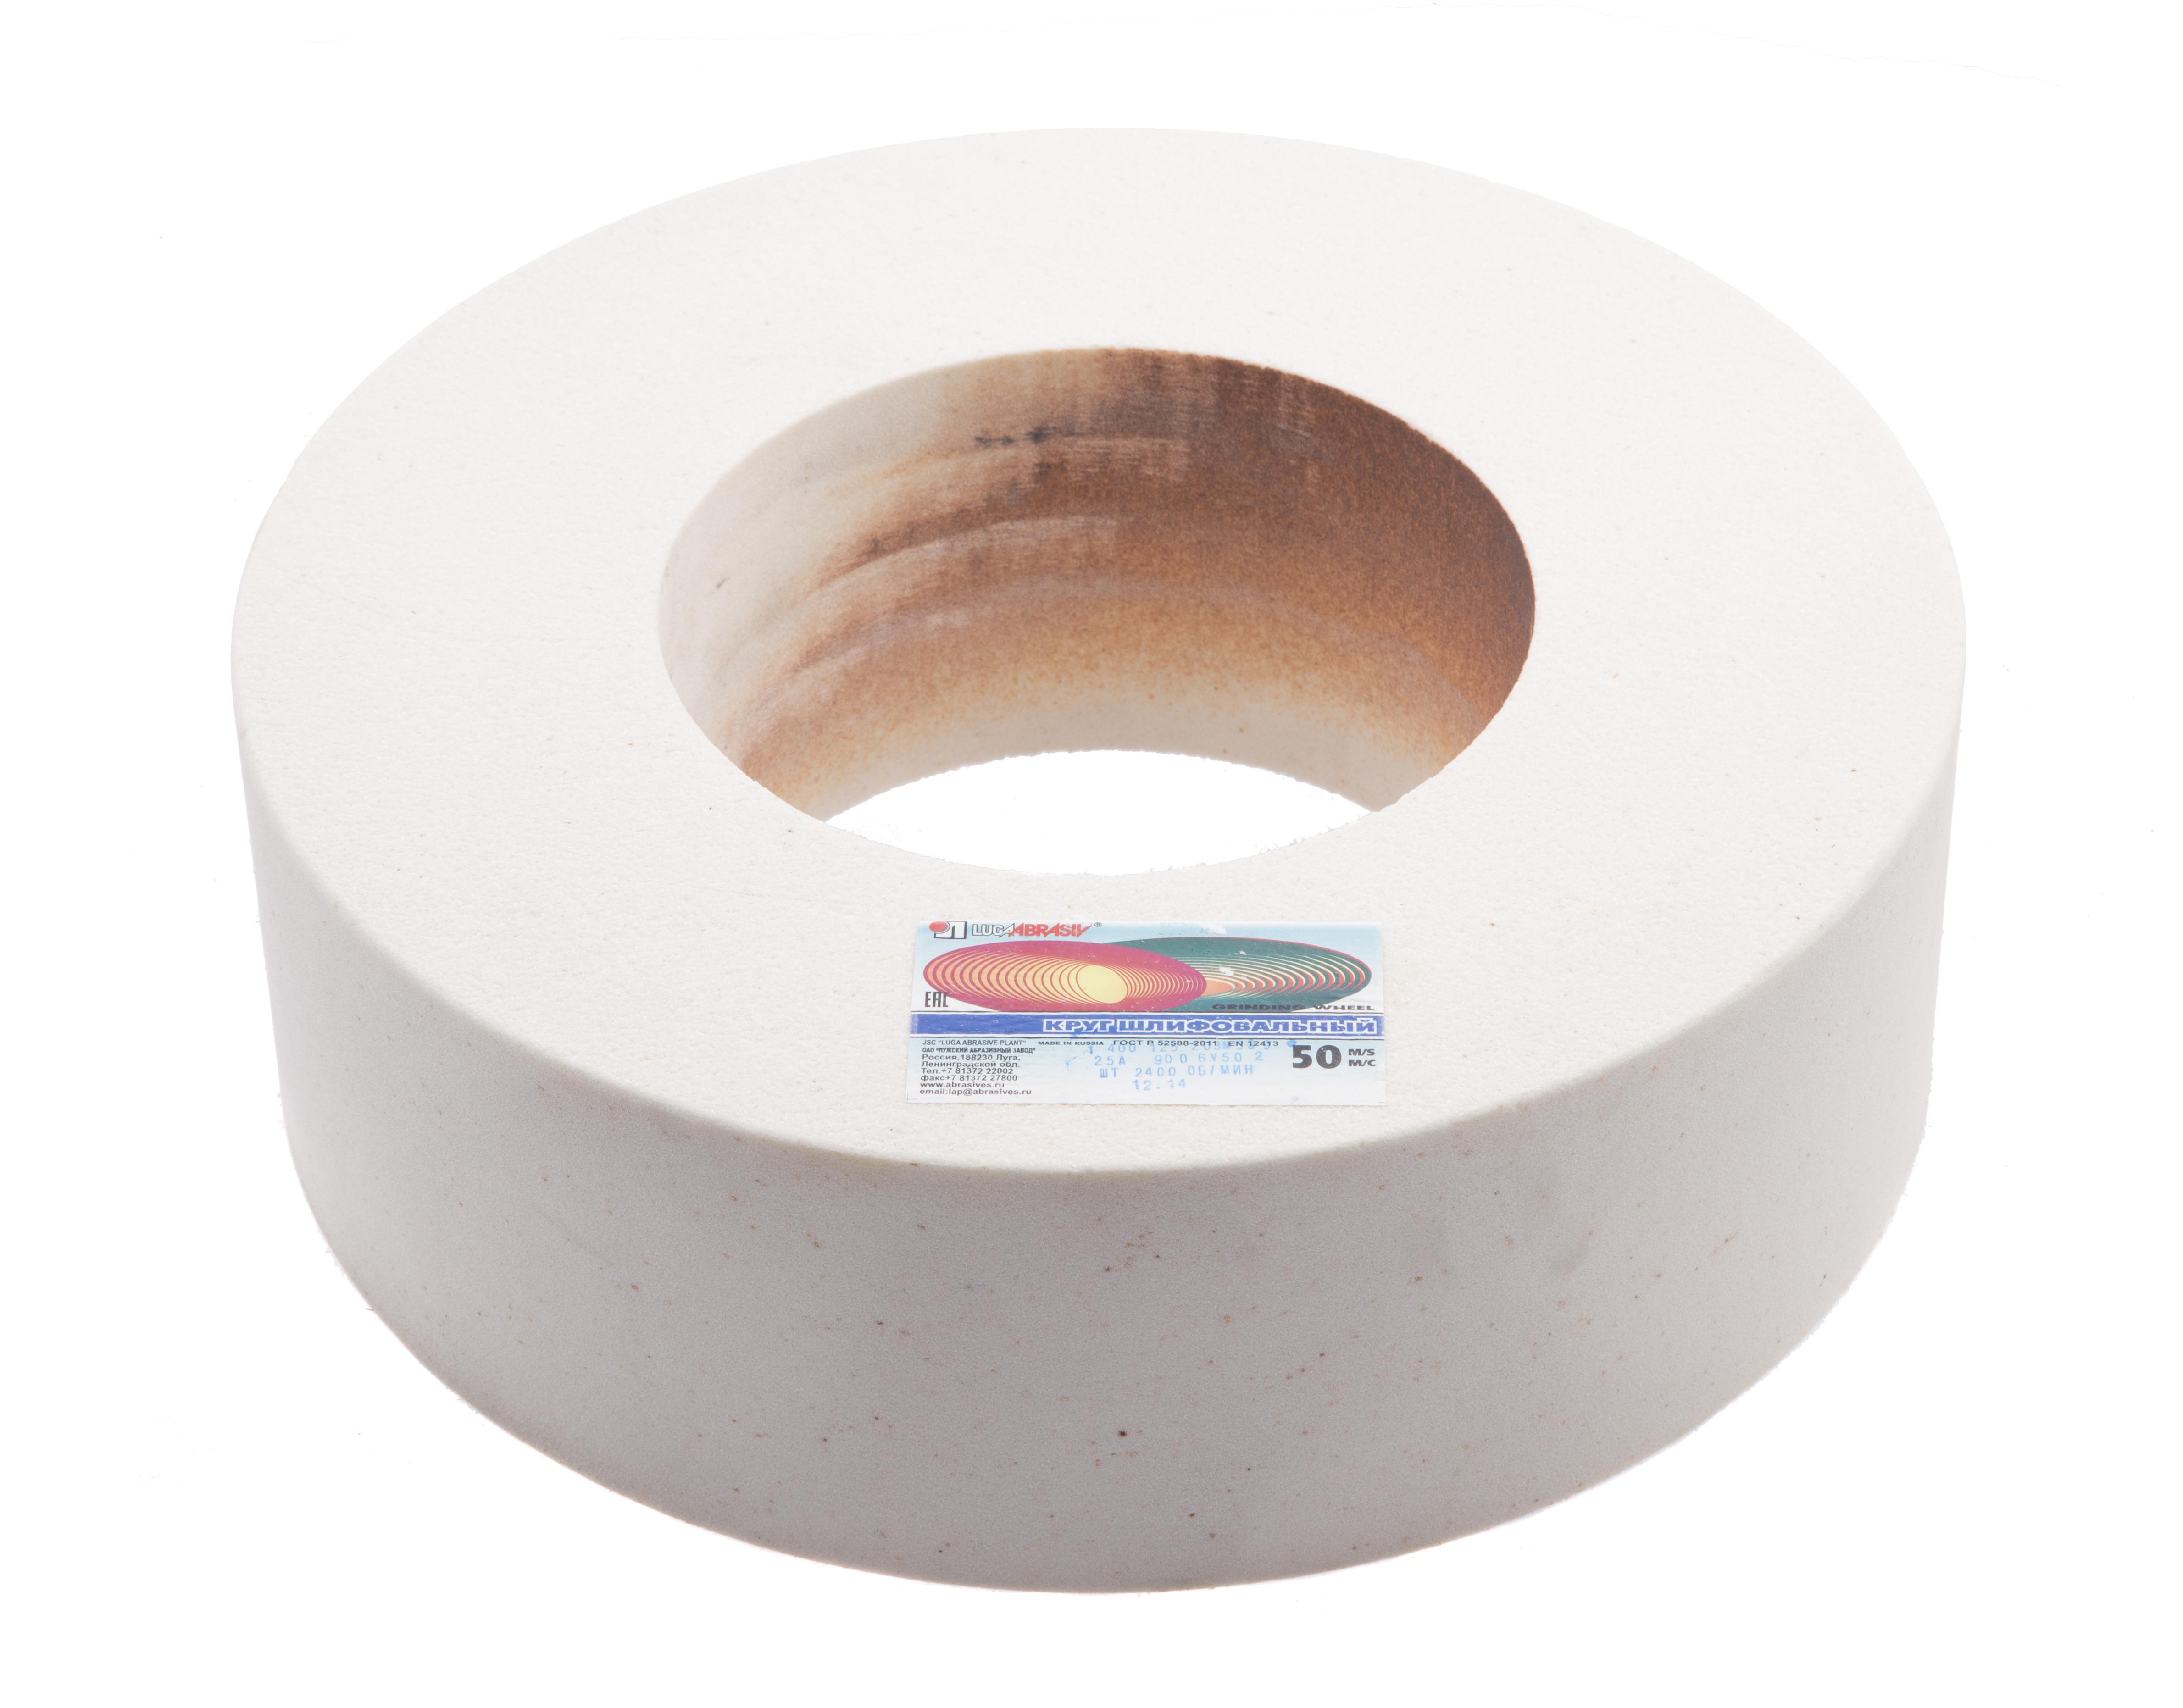 лучшая цена Круг шлифовальный ЛУГА-АБРАЗИВ 1 400 Х125 Х 203 25А 90 o,p,q (16СТ)